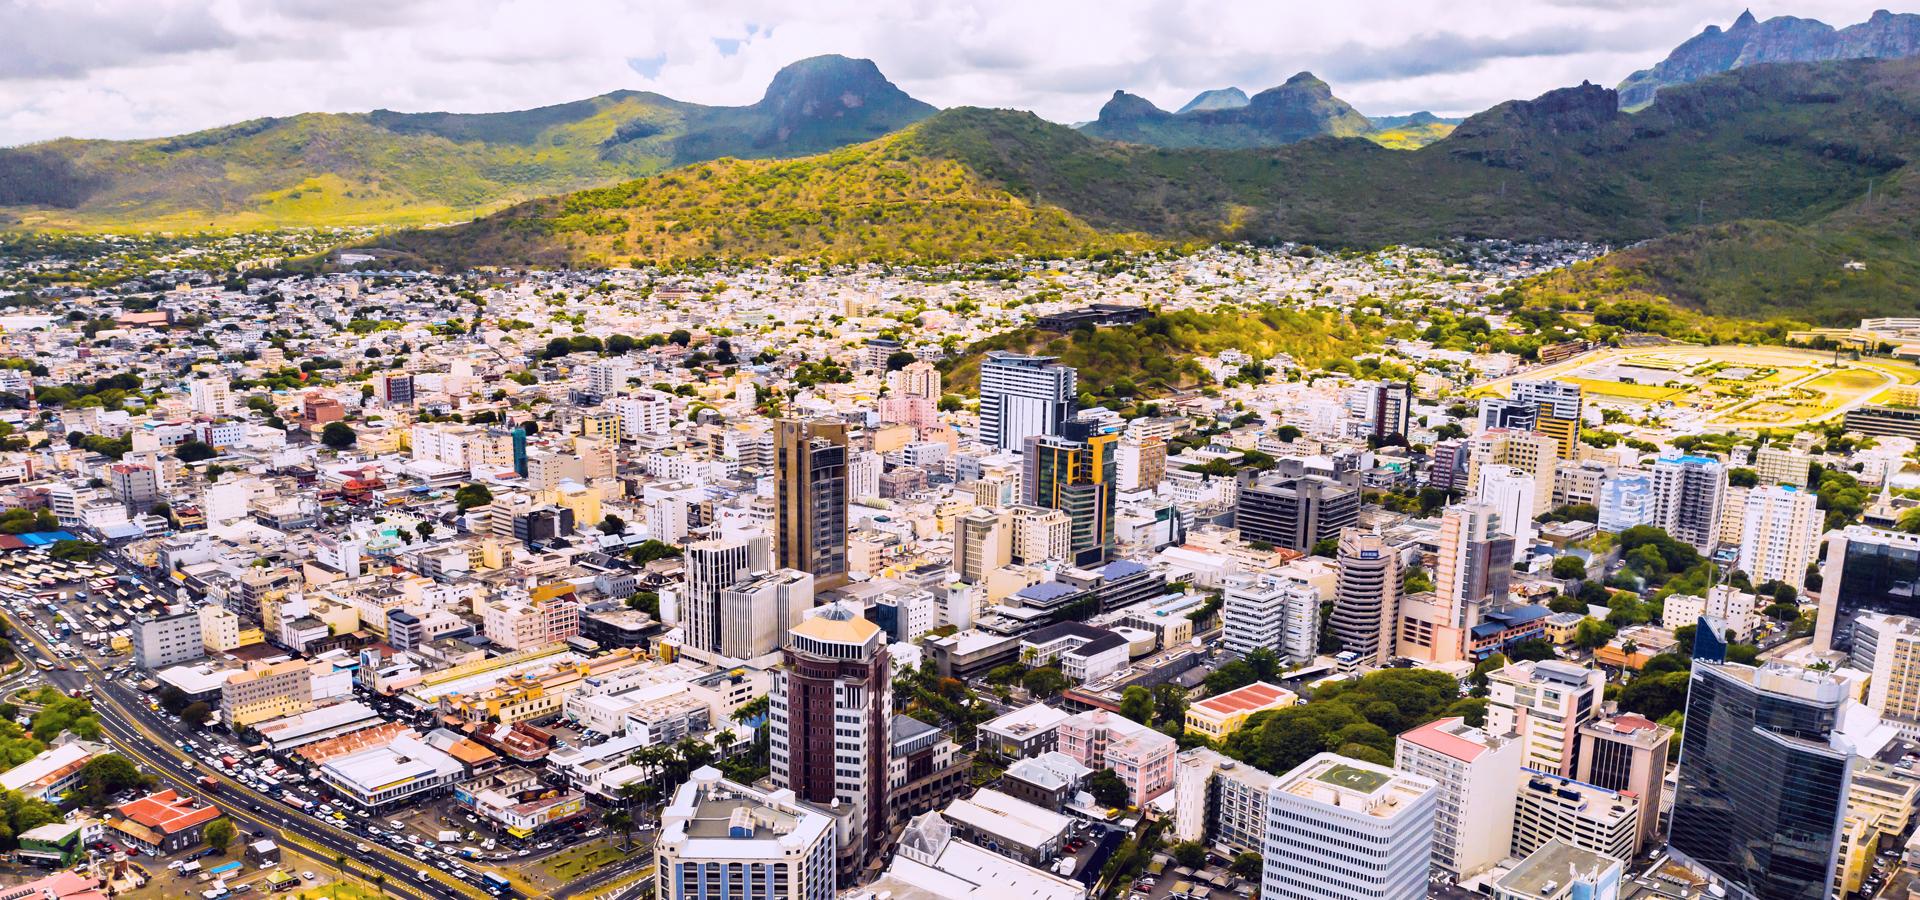 <b>Indian/Mauritius/Port_Louis_District</b>